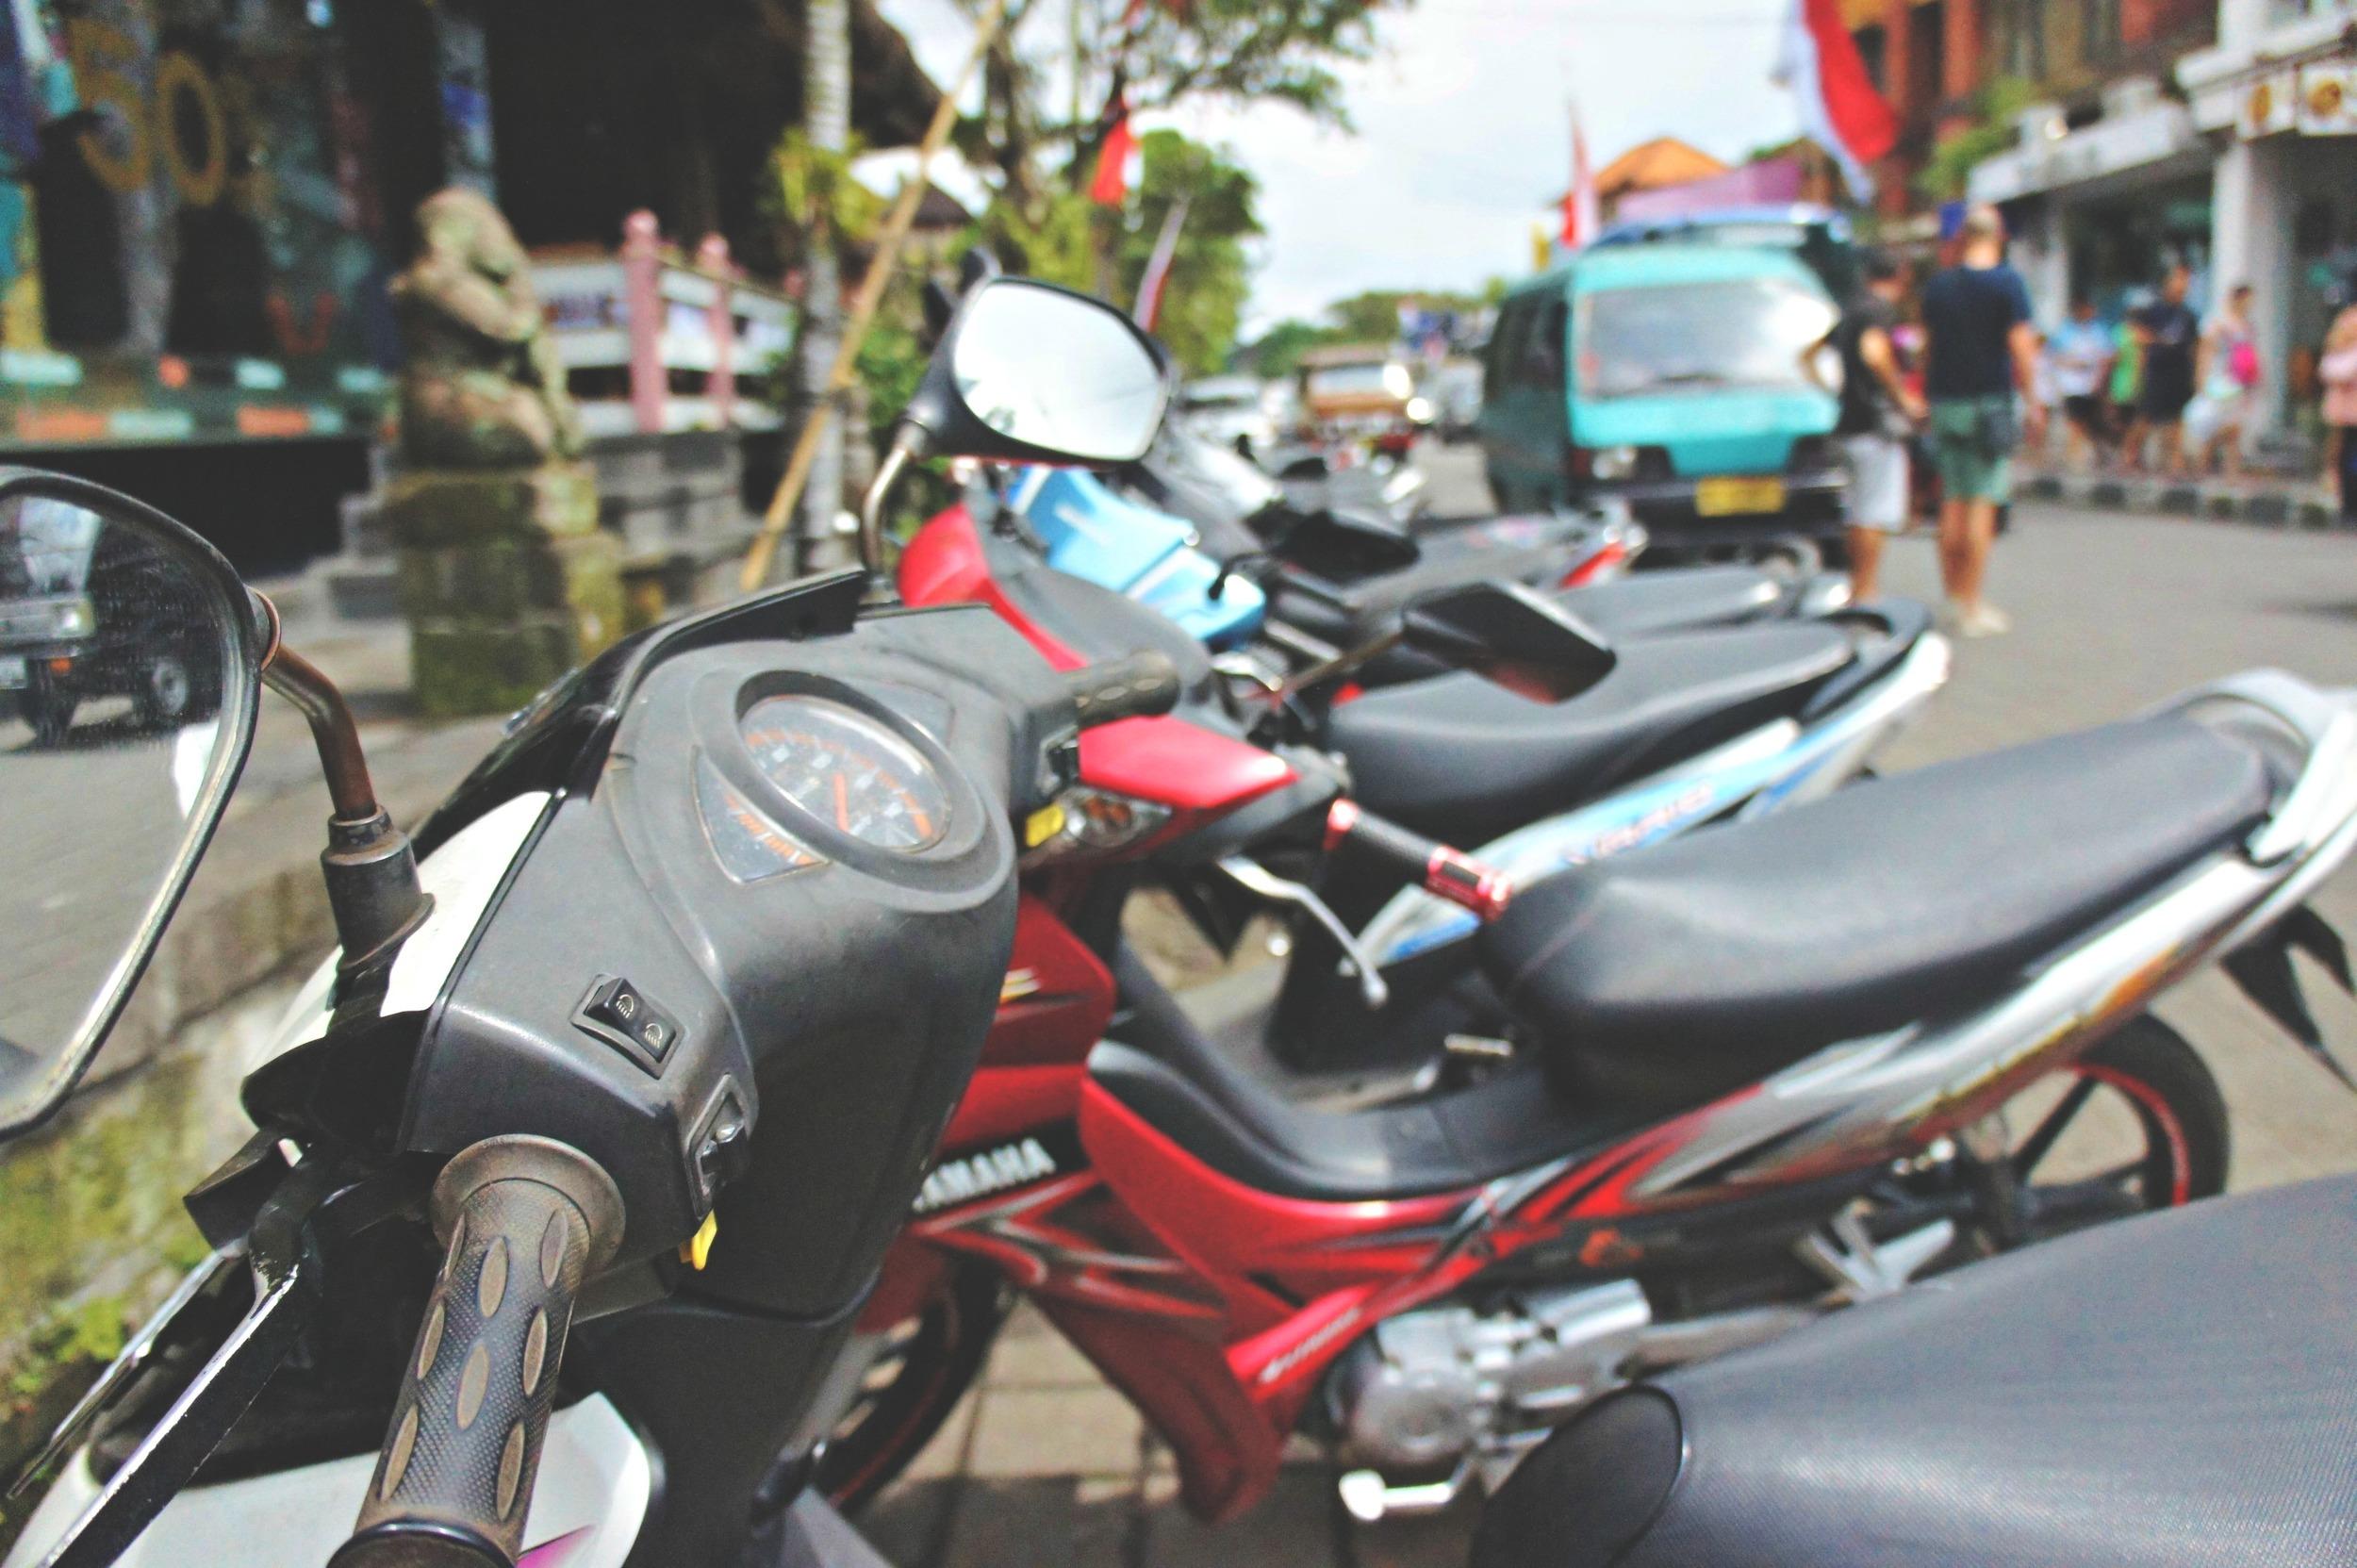 Motorbikes Jalan Raya Ubud